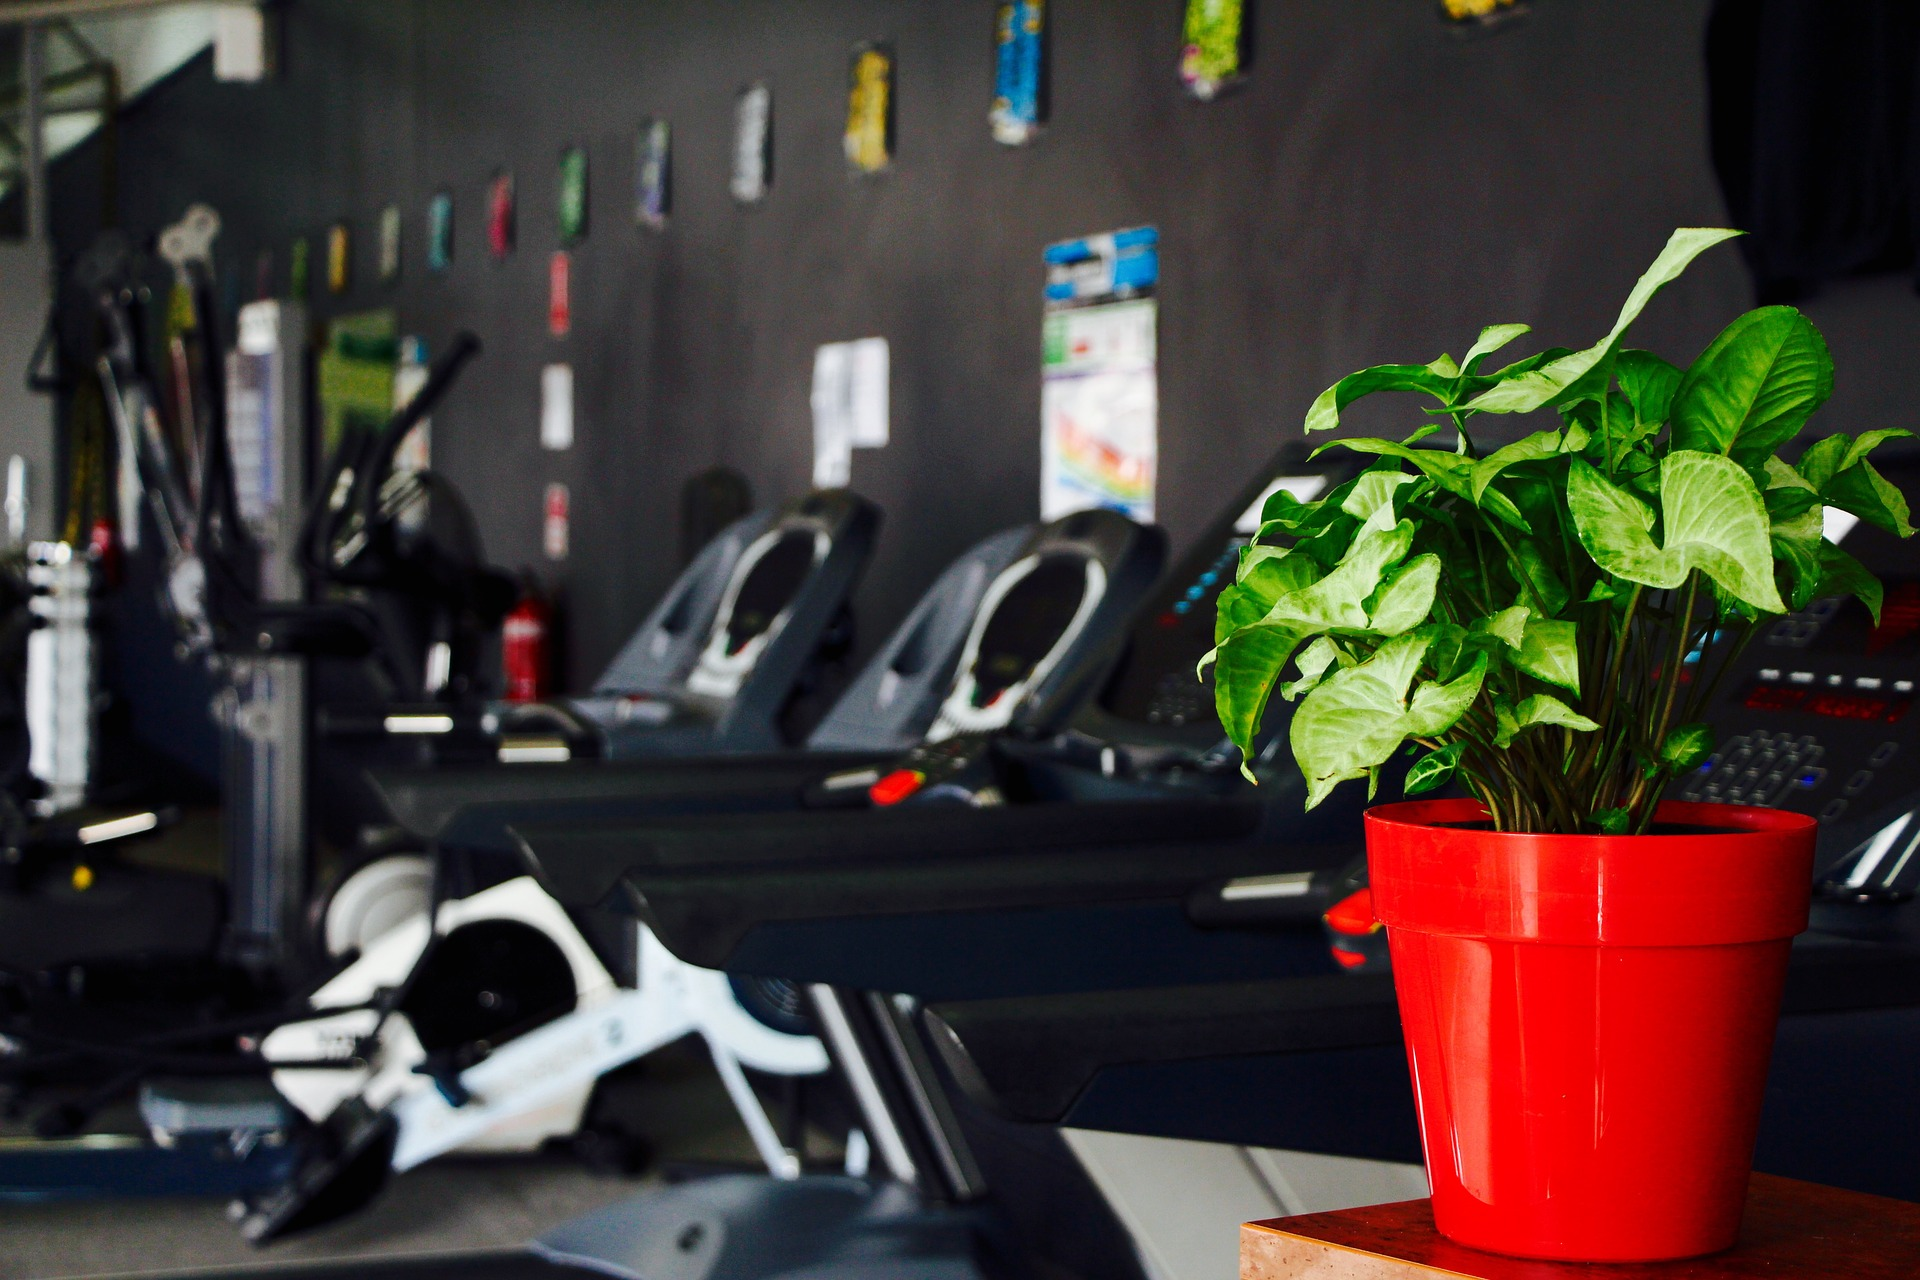 Mammut edzőterem, avagy a Lite Wellness Club - Edzoterem.info